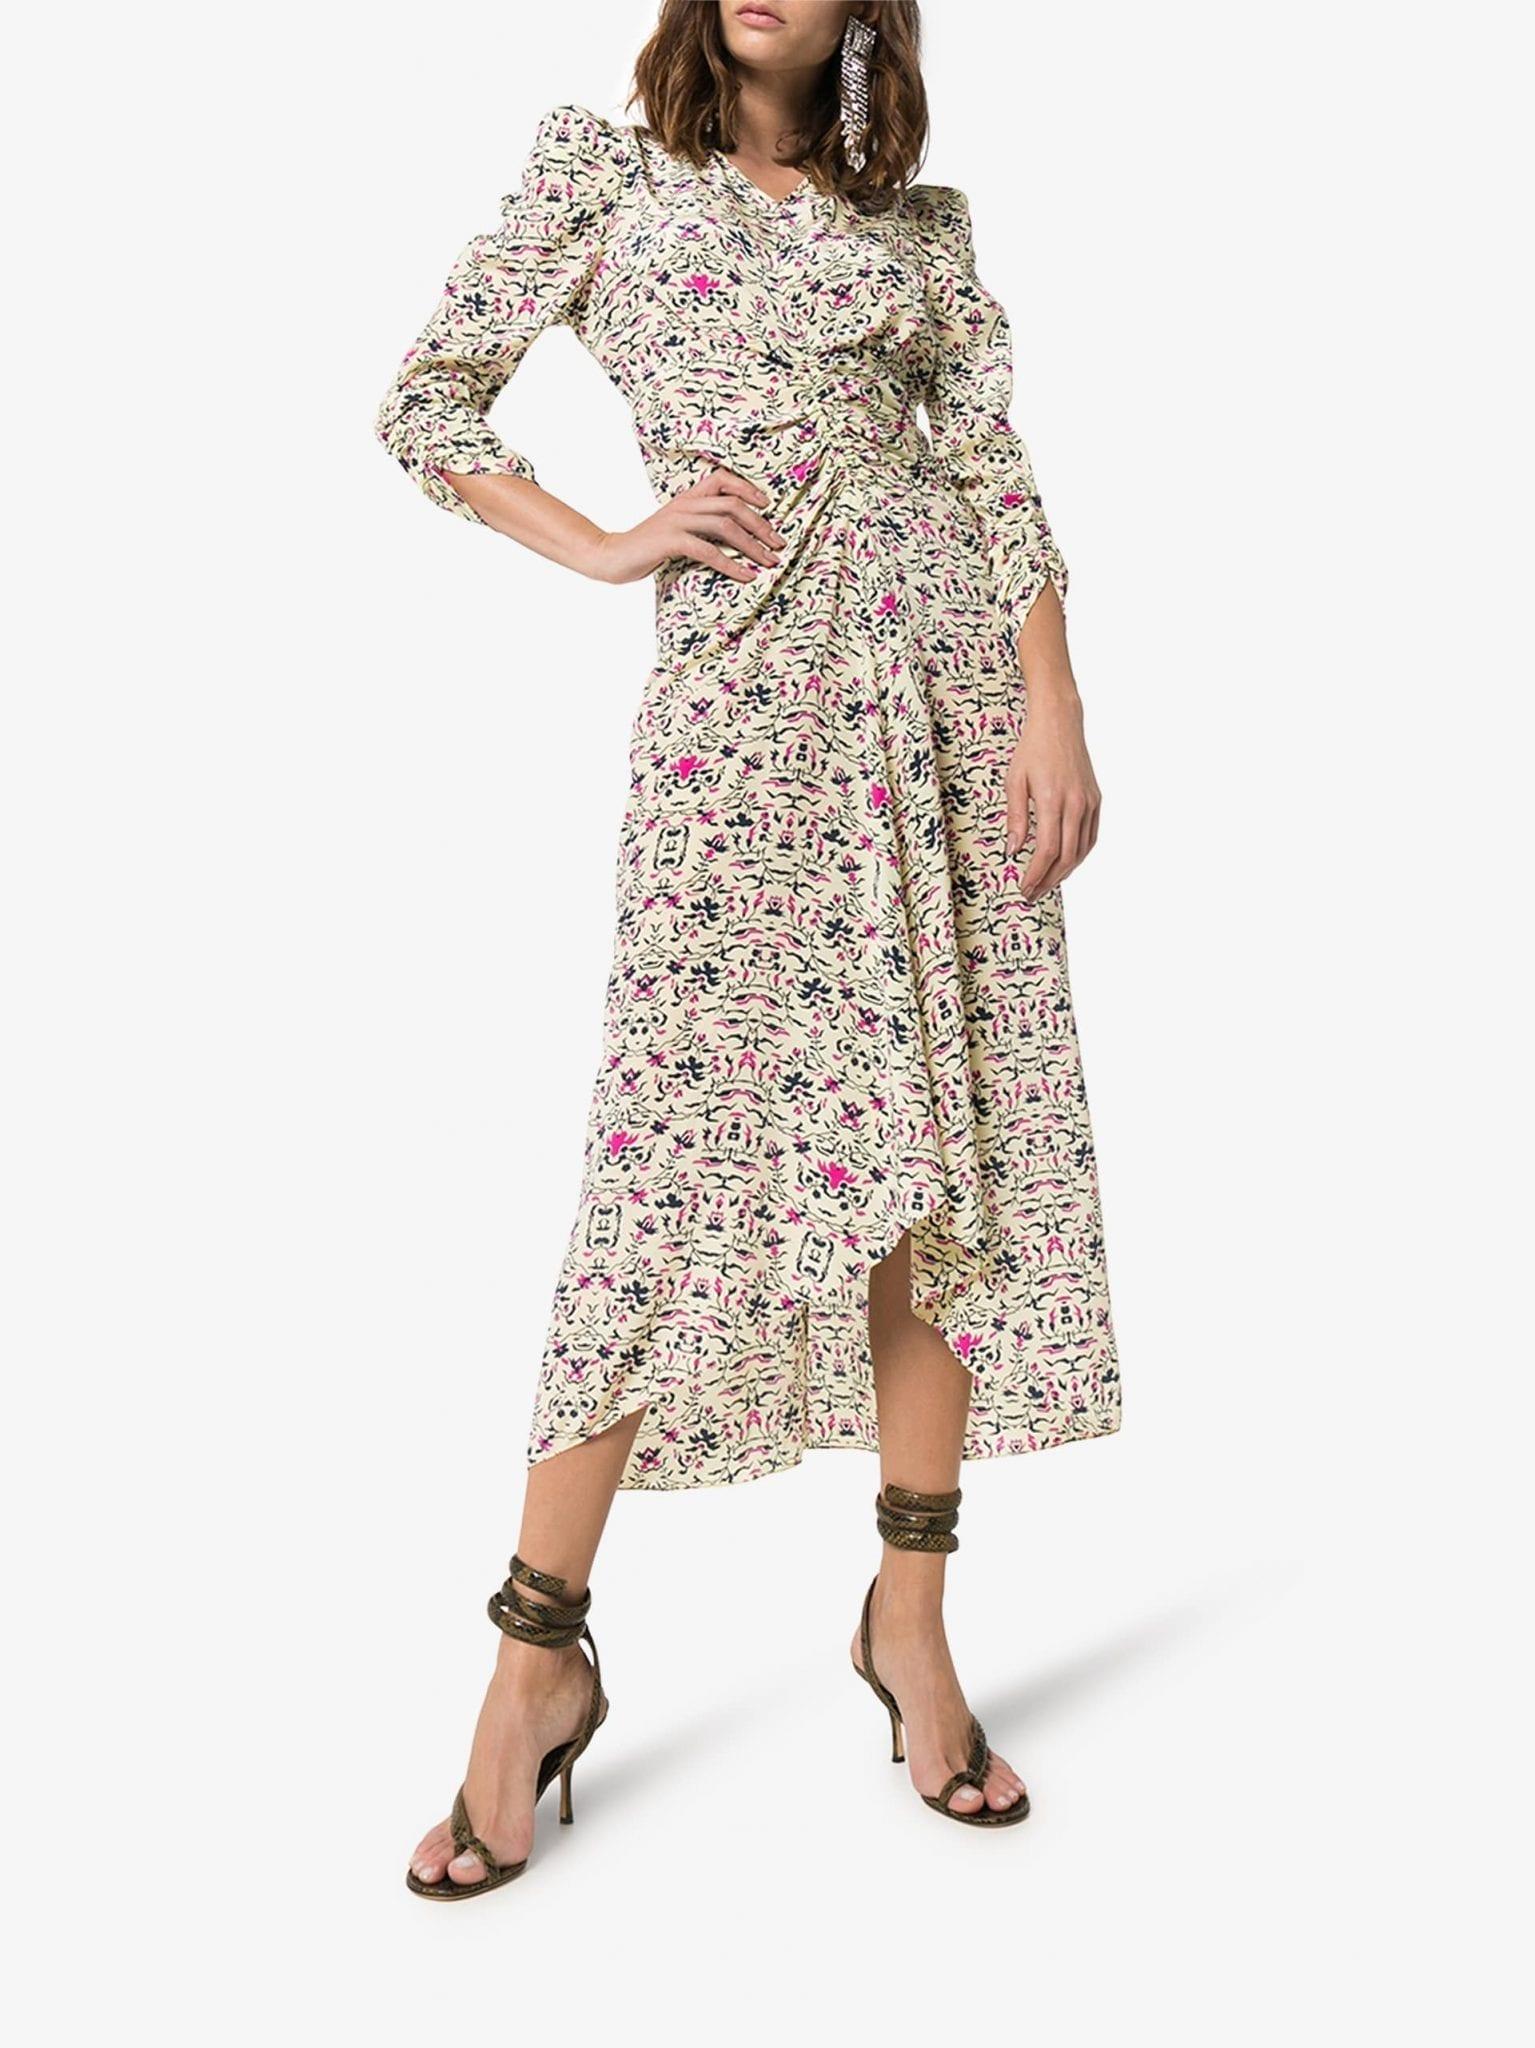 ISABEL MARANT Albi Graphic Floral Silk Dress